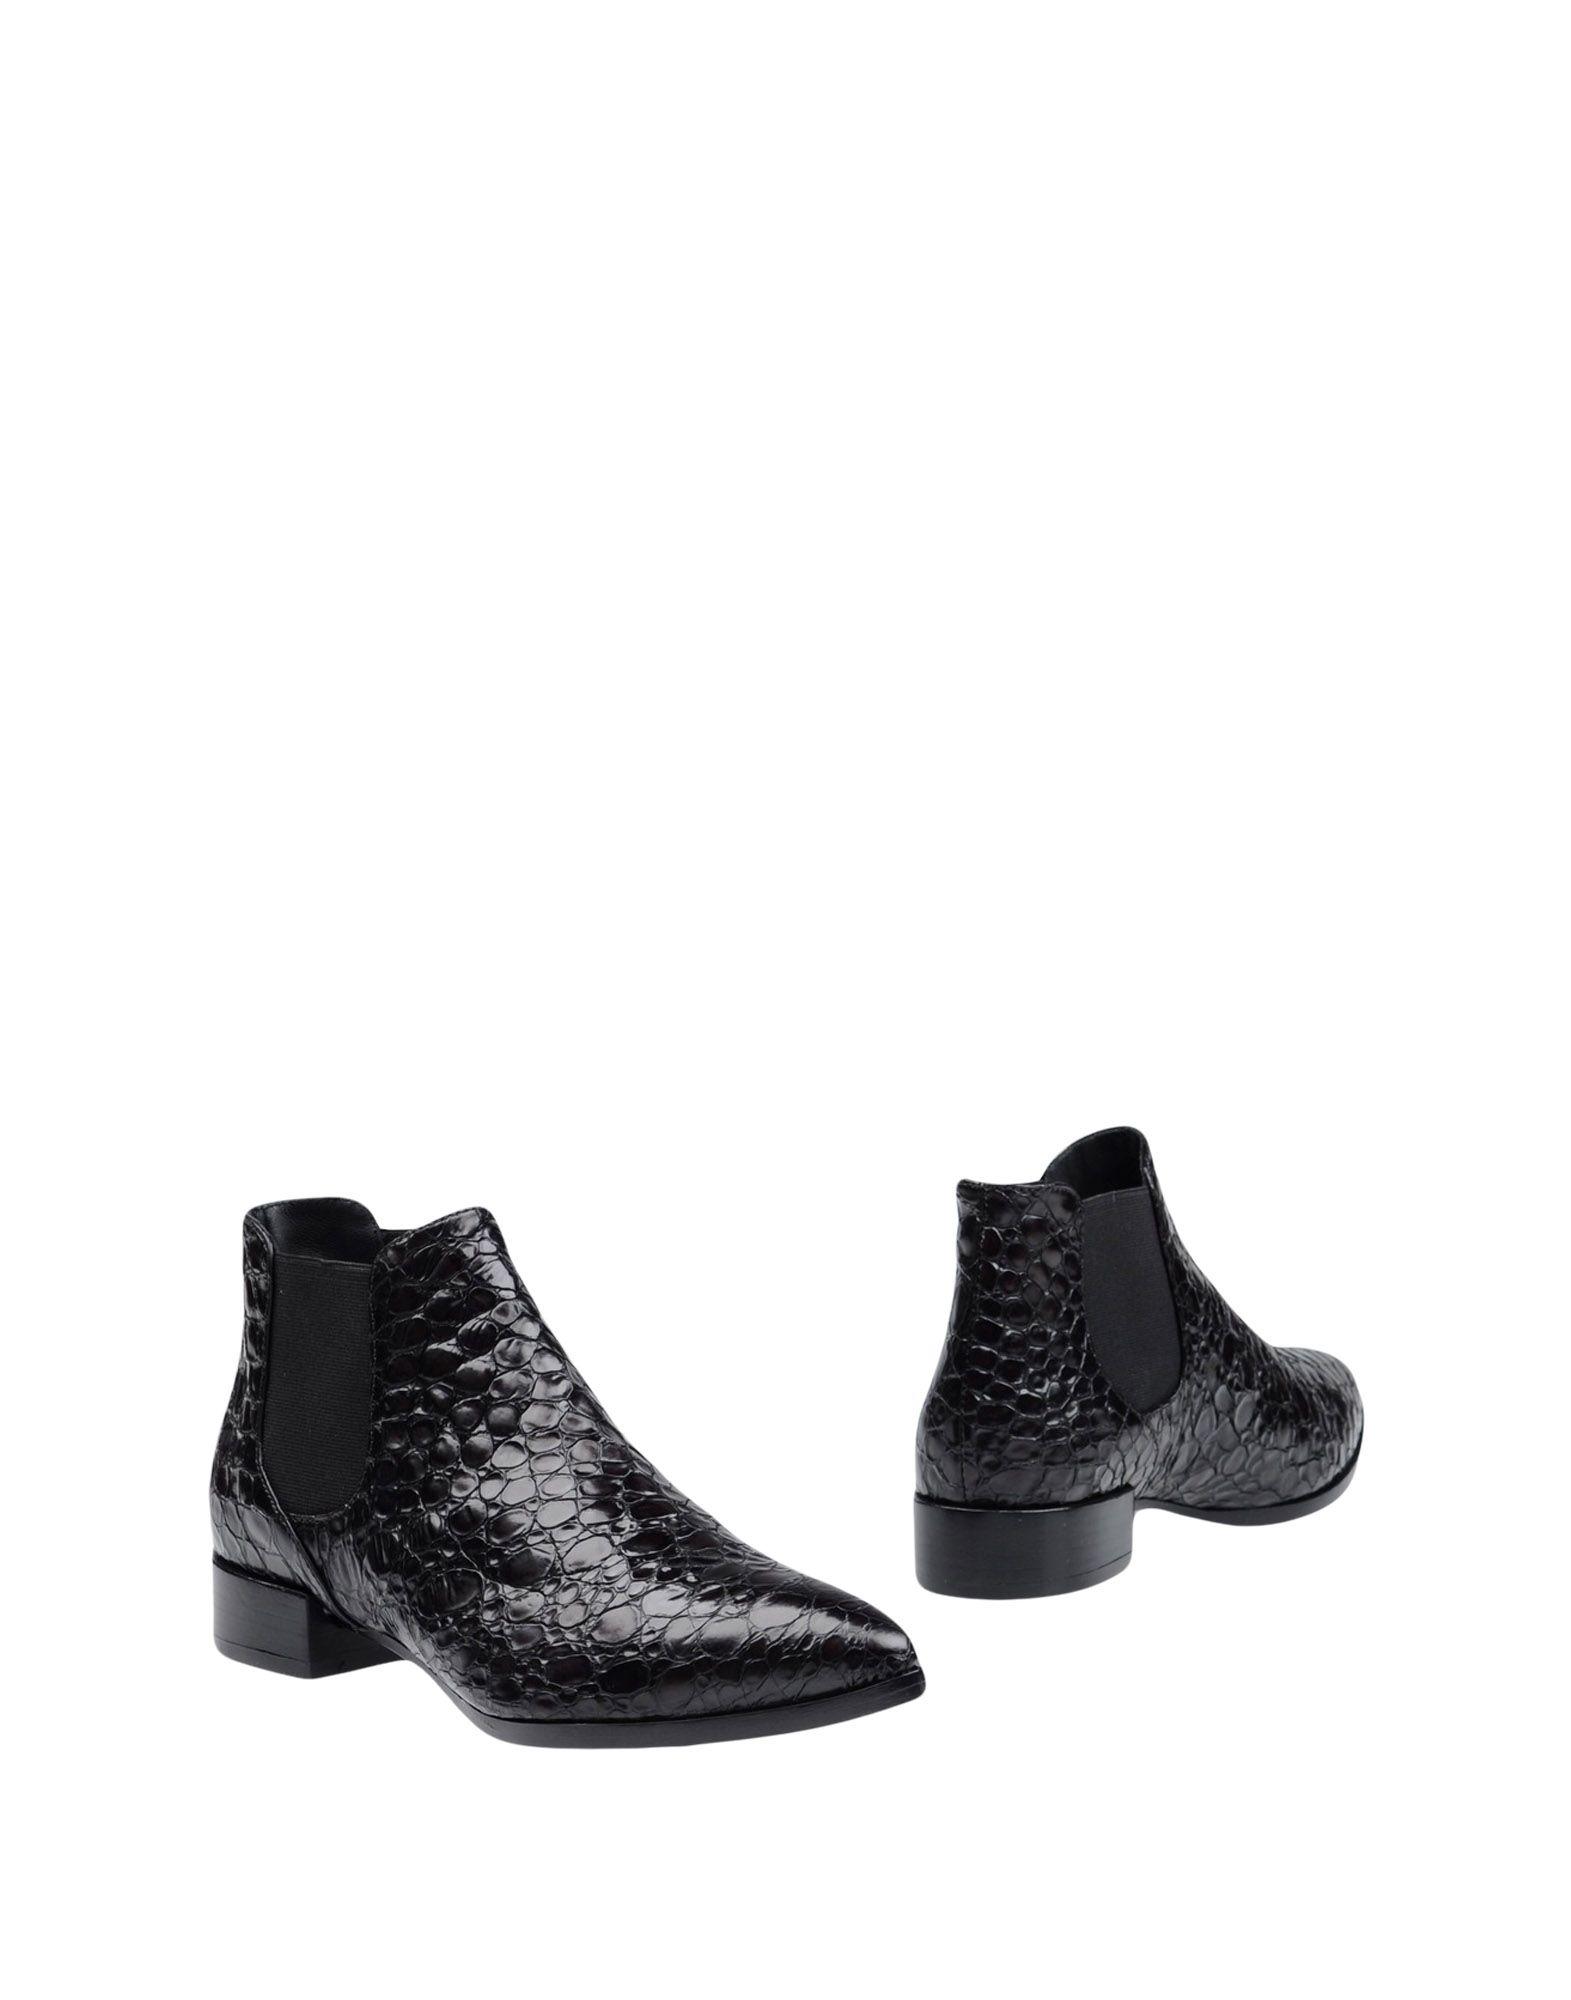 Giancarlo Paoli Chelsea Boots Damen  11252013FP Schuhe Neue Schuhe 11252013FP ca1fca